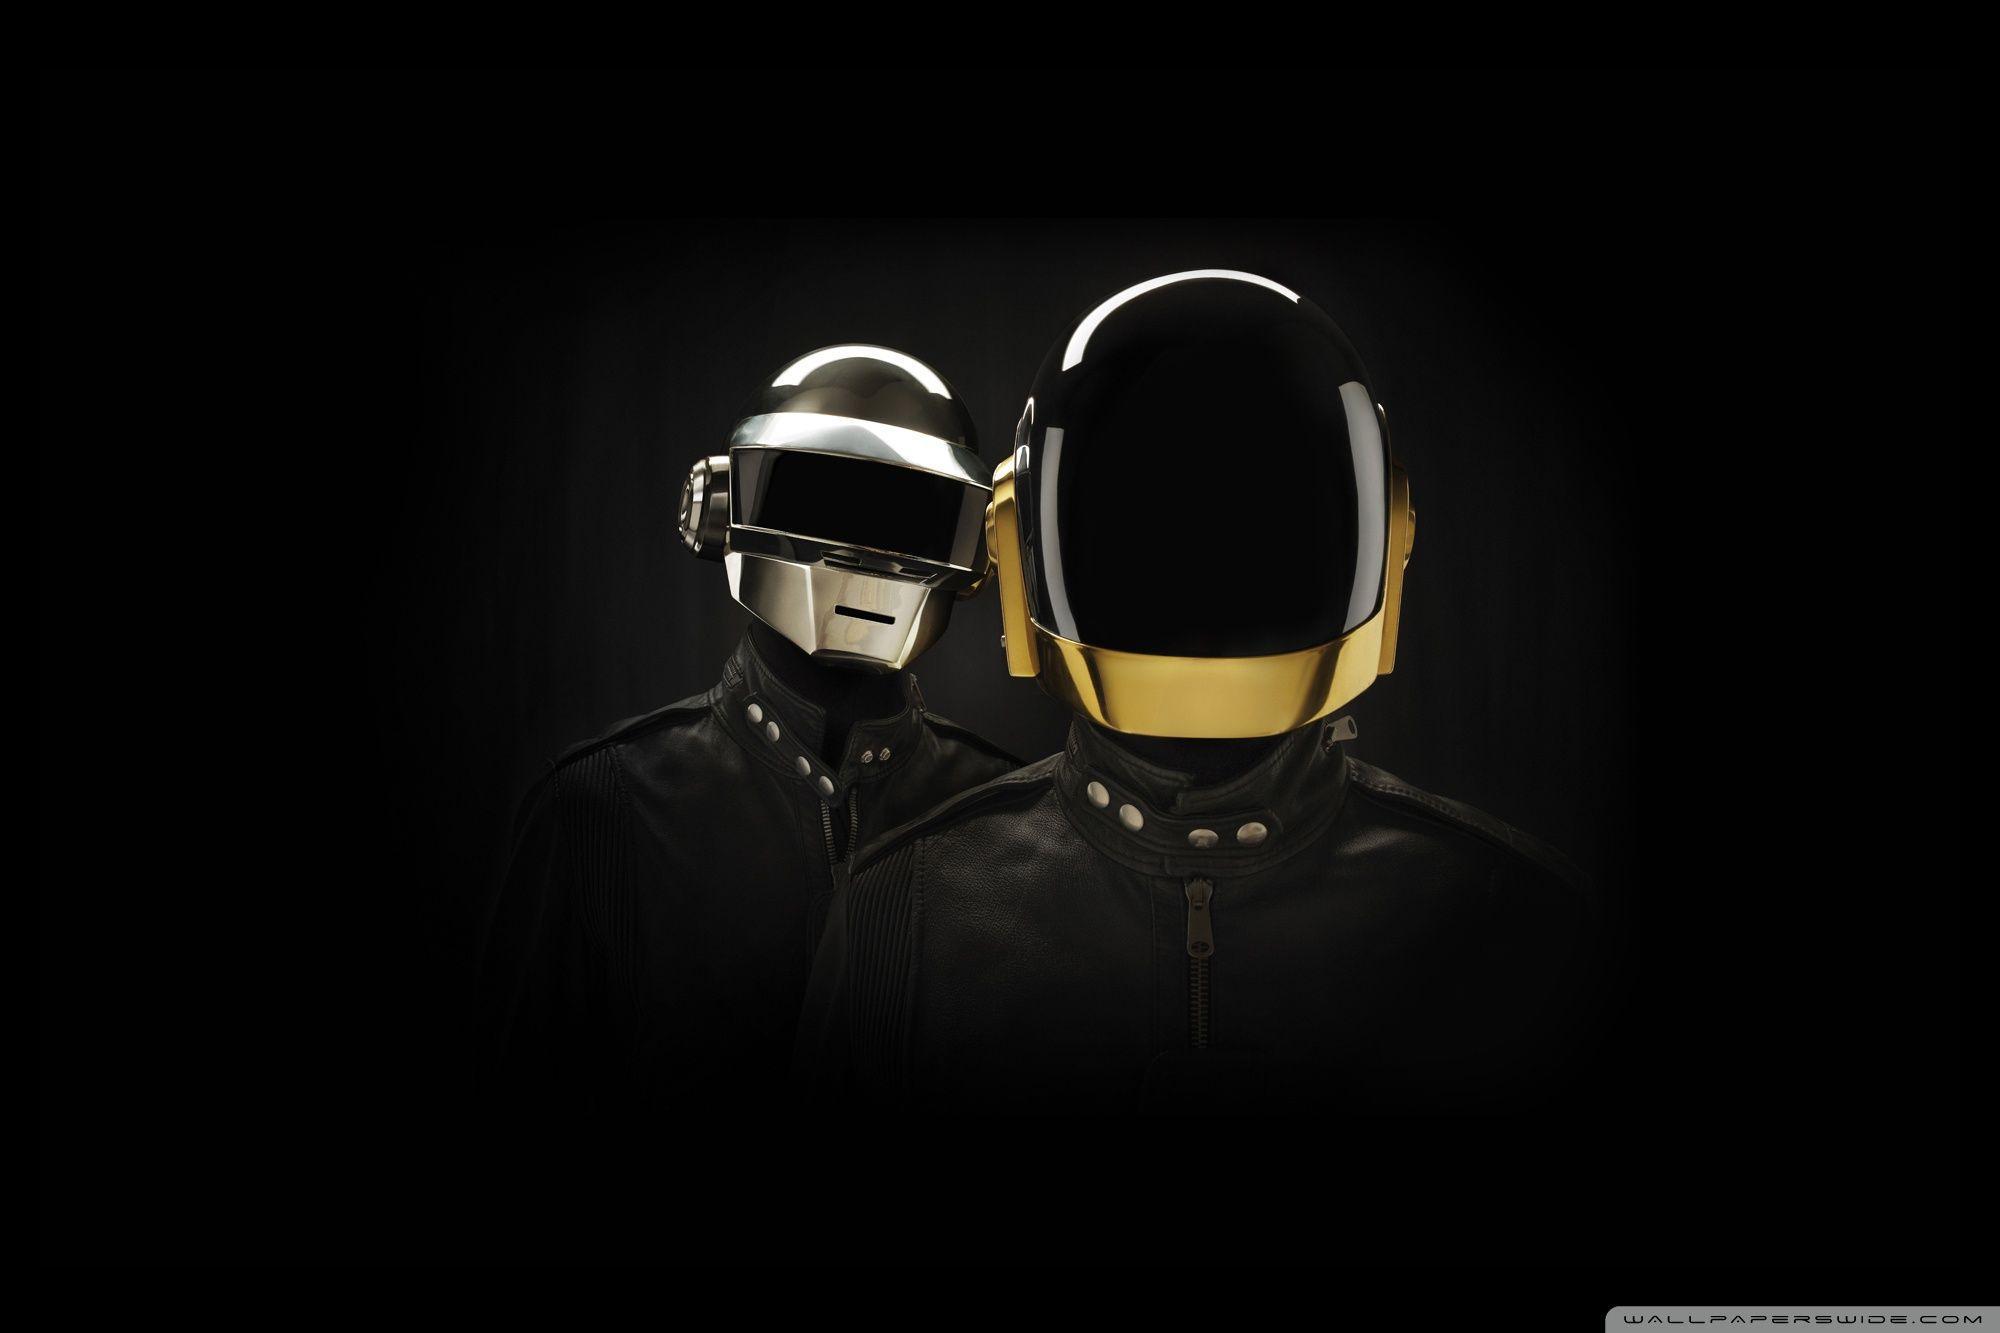 Daft Punk Wallpapers Hd Wallpaper Cave